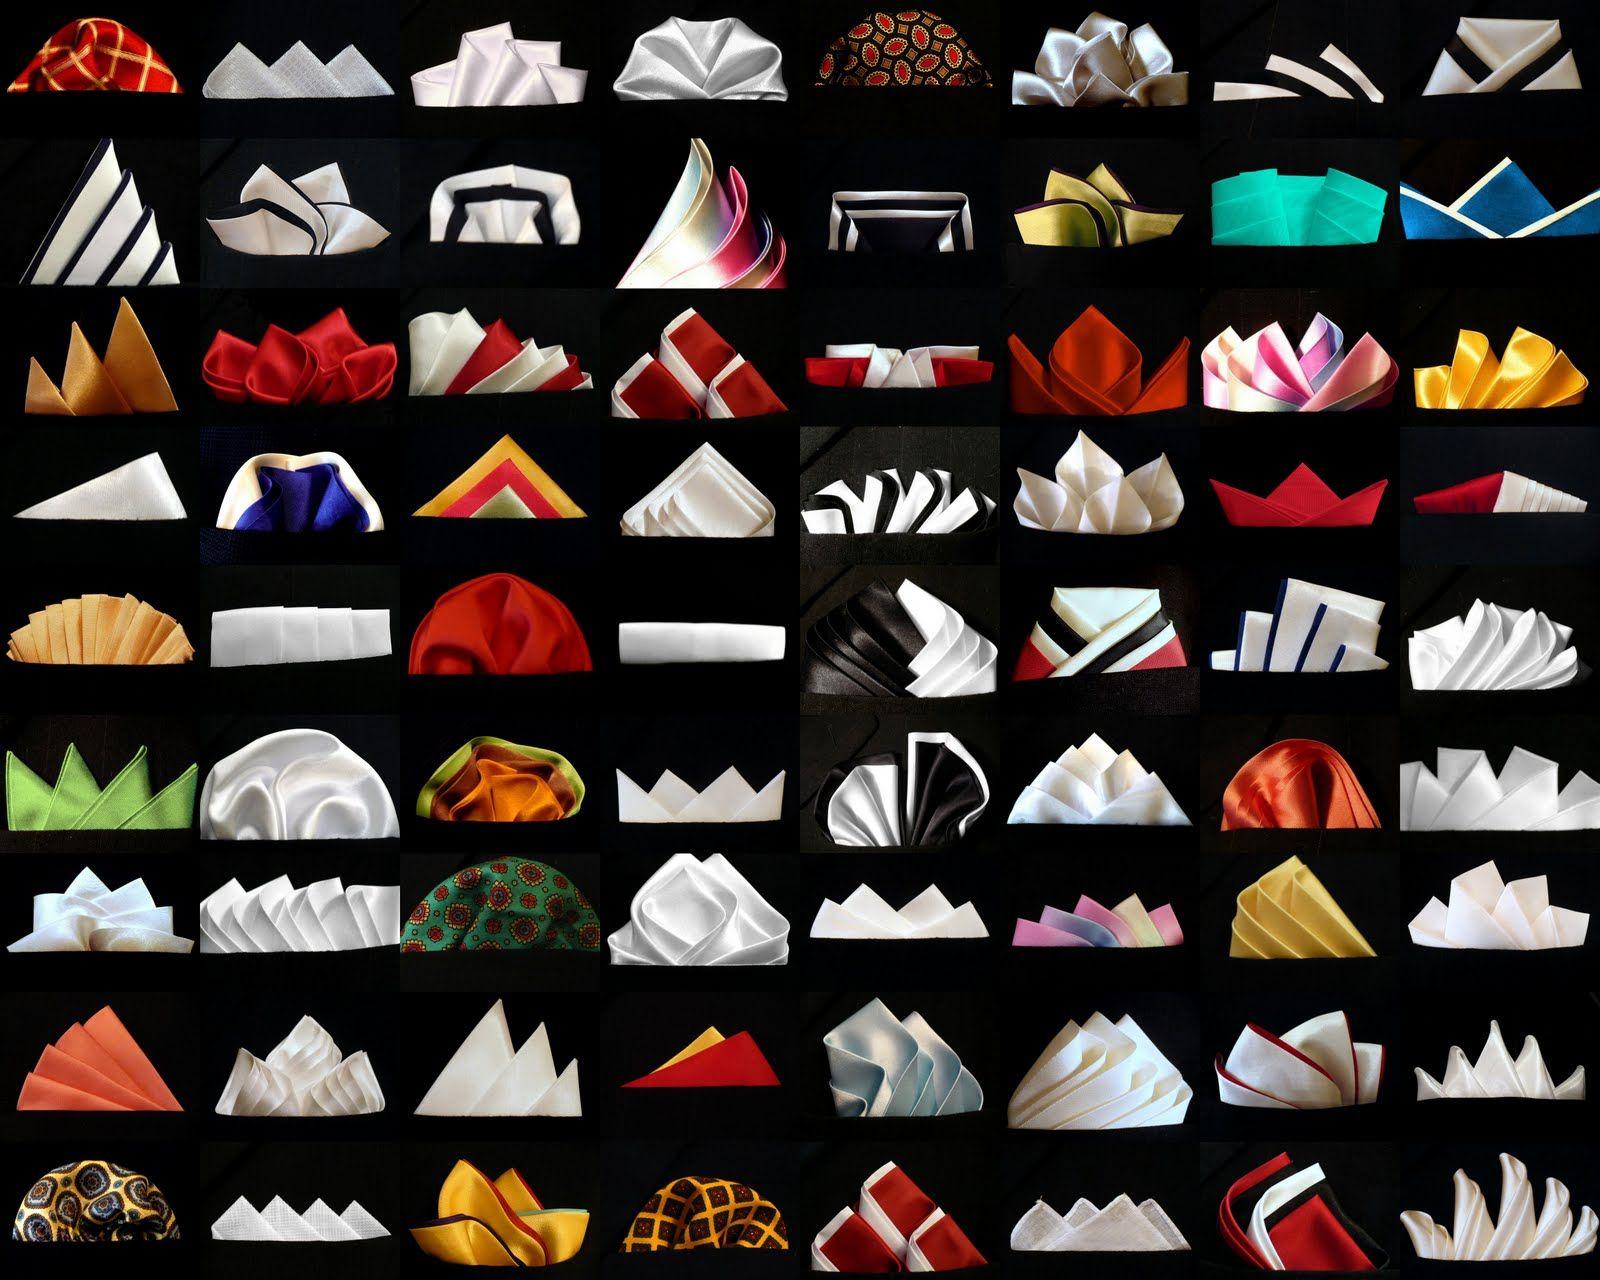 Mens jacket pocket handkerchief - Diferentes Formas De Colocarte El Pa Uelo En El Bolsillo De La Chaqueta Diferents Formes Pocket Square